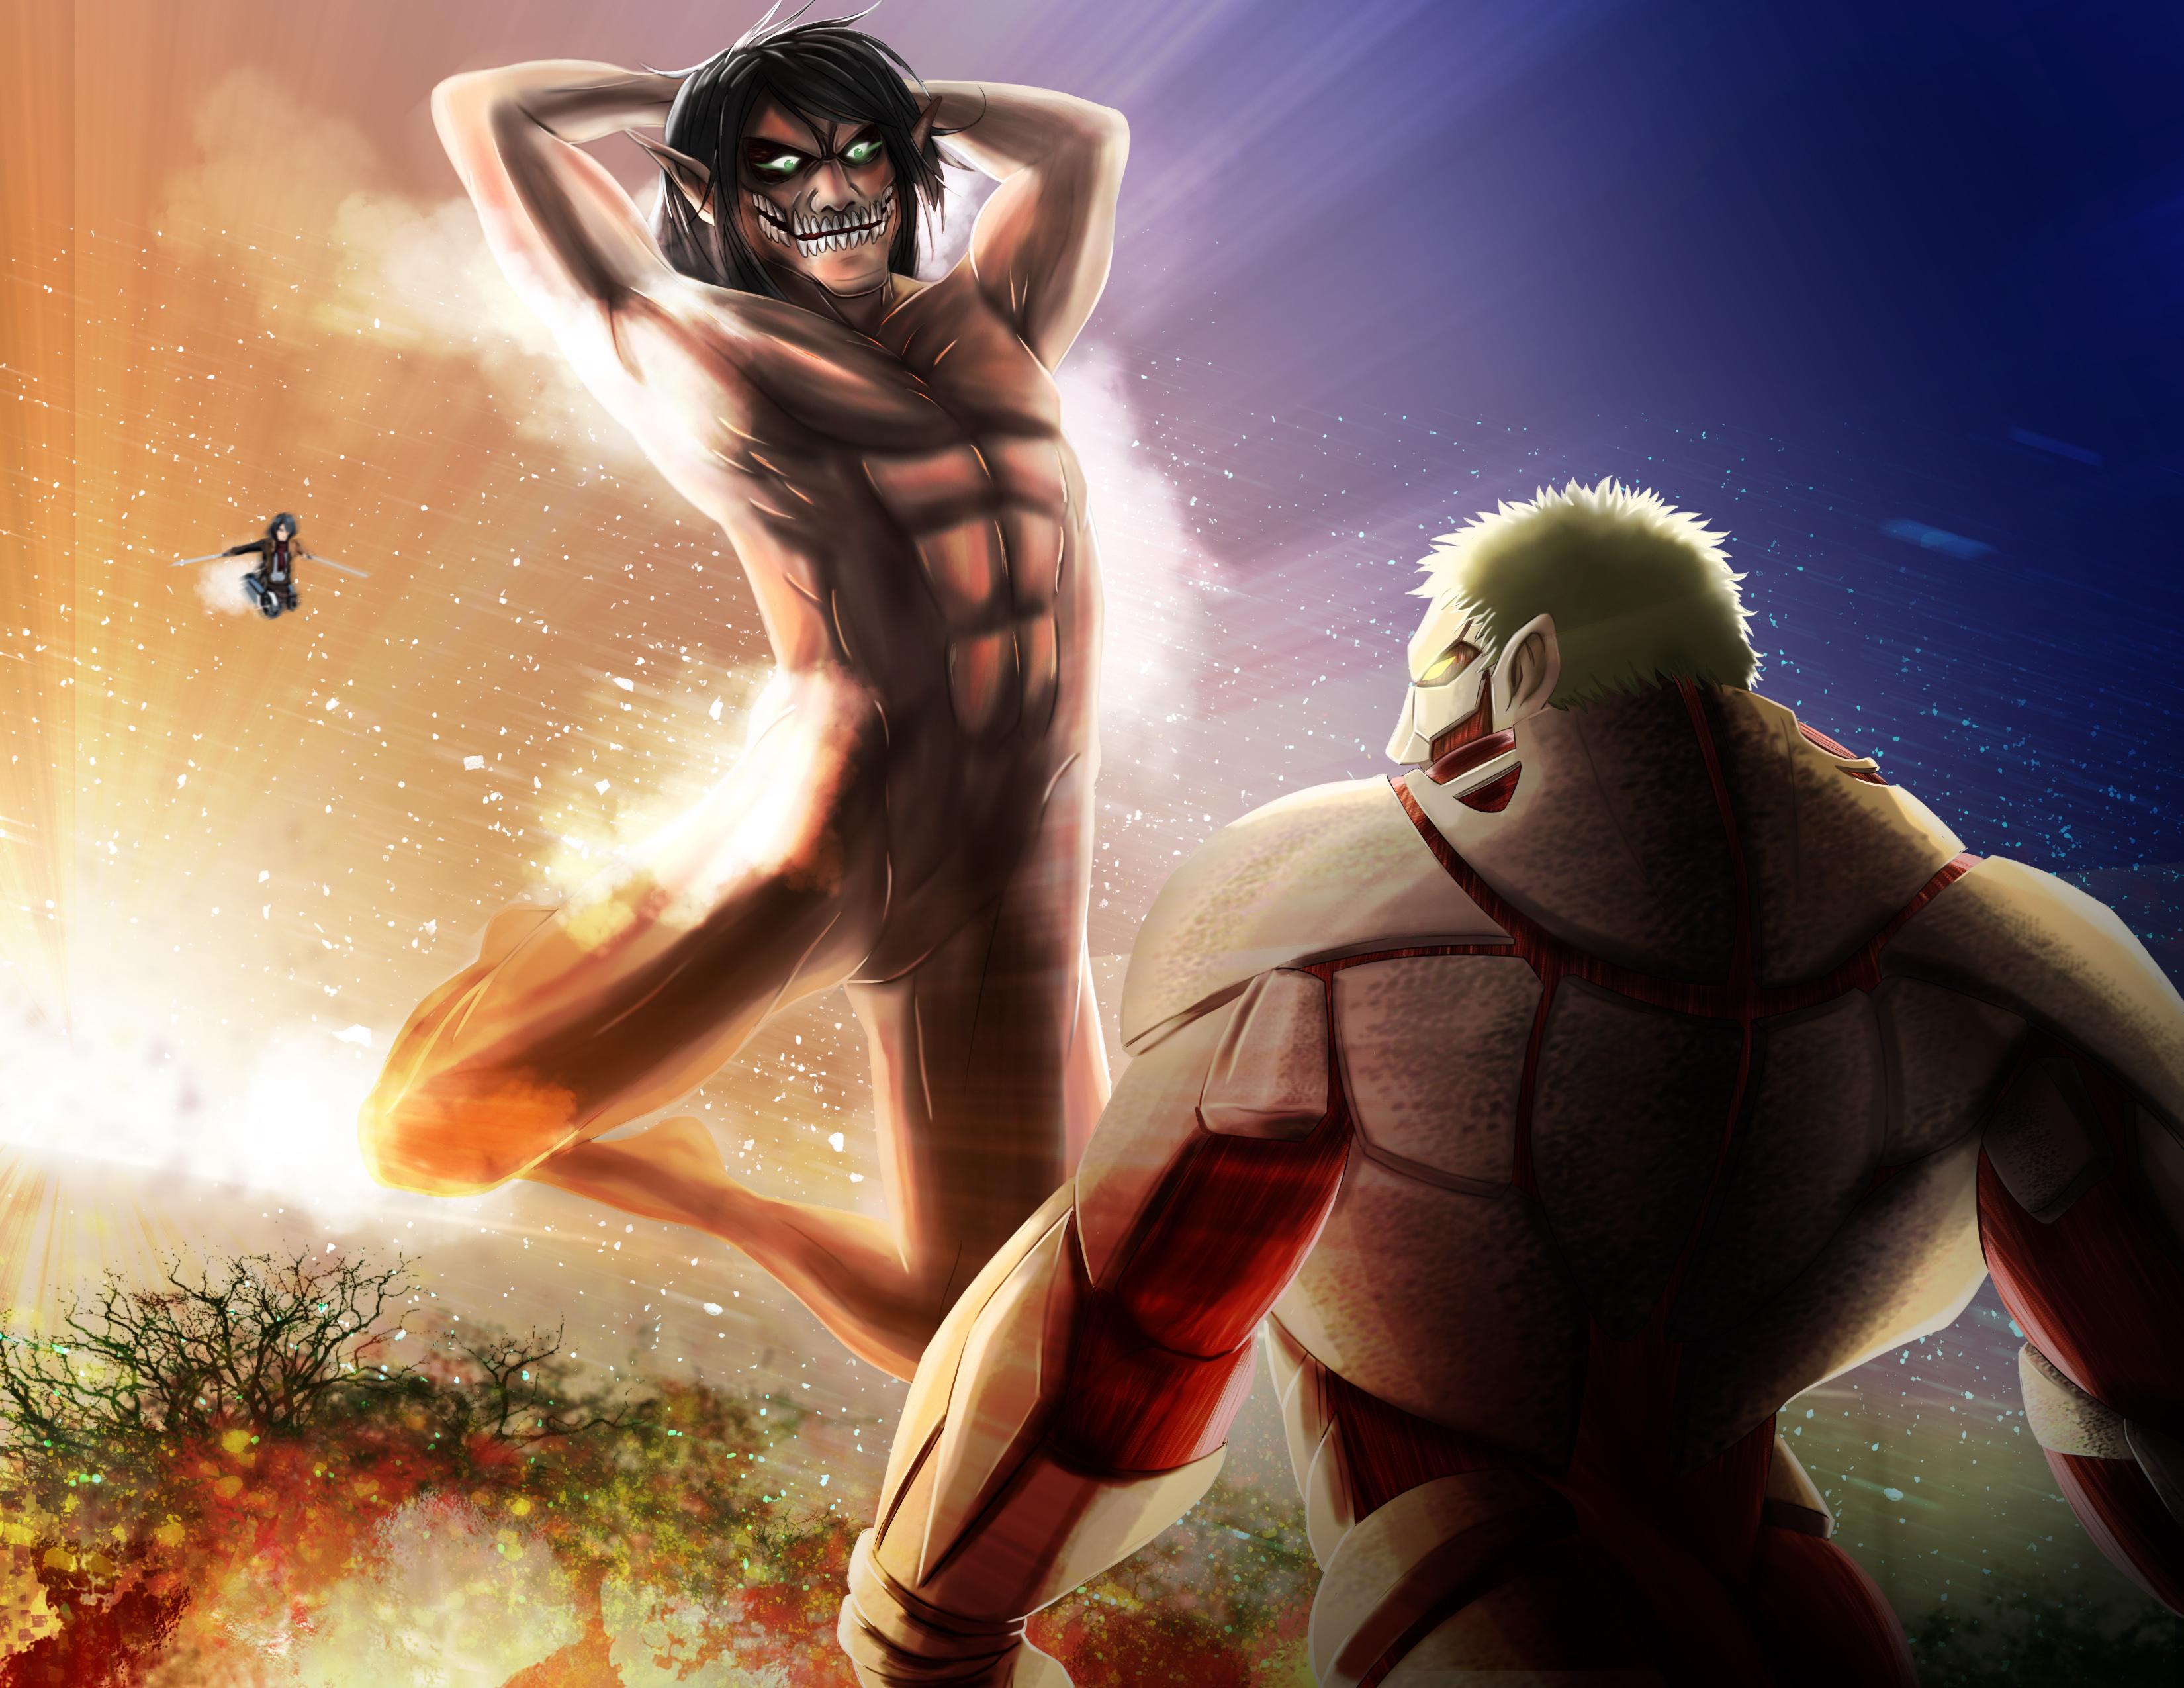 Attack On Titan Eren Yeager Mikasa Ackerman Reiner Braun Shingeki No Kyojin Wallpaper Resolution 3300x2550 Id 889885 Wallha Com